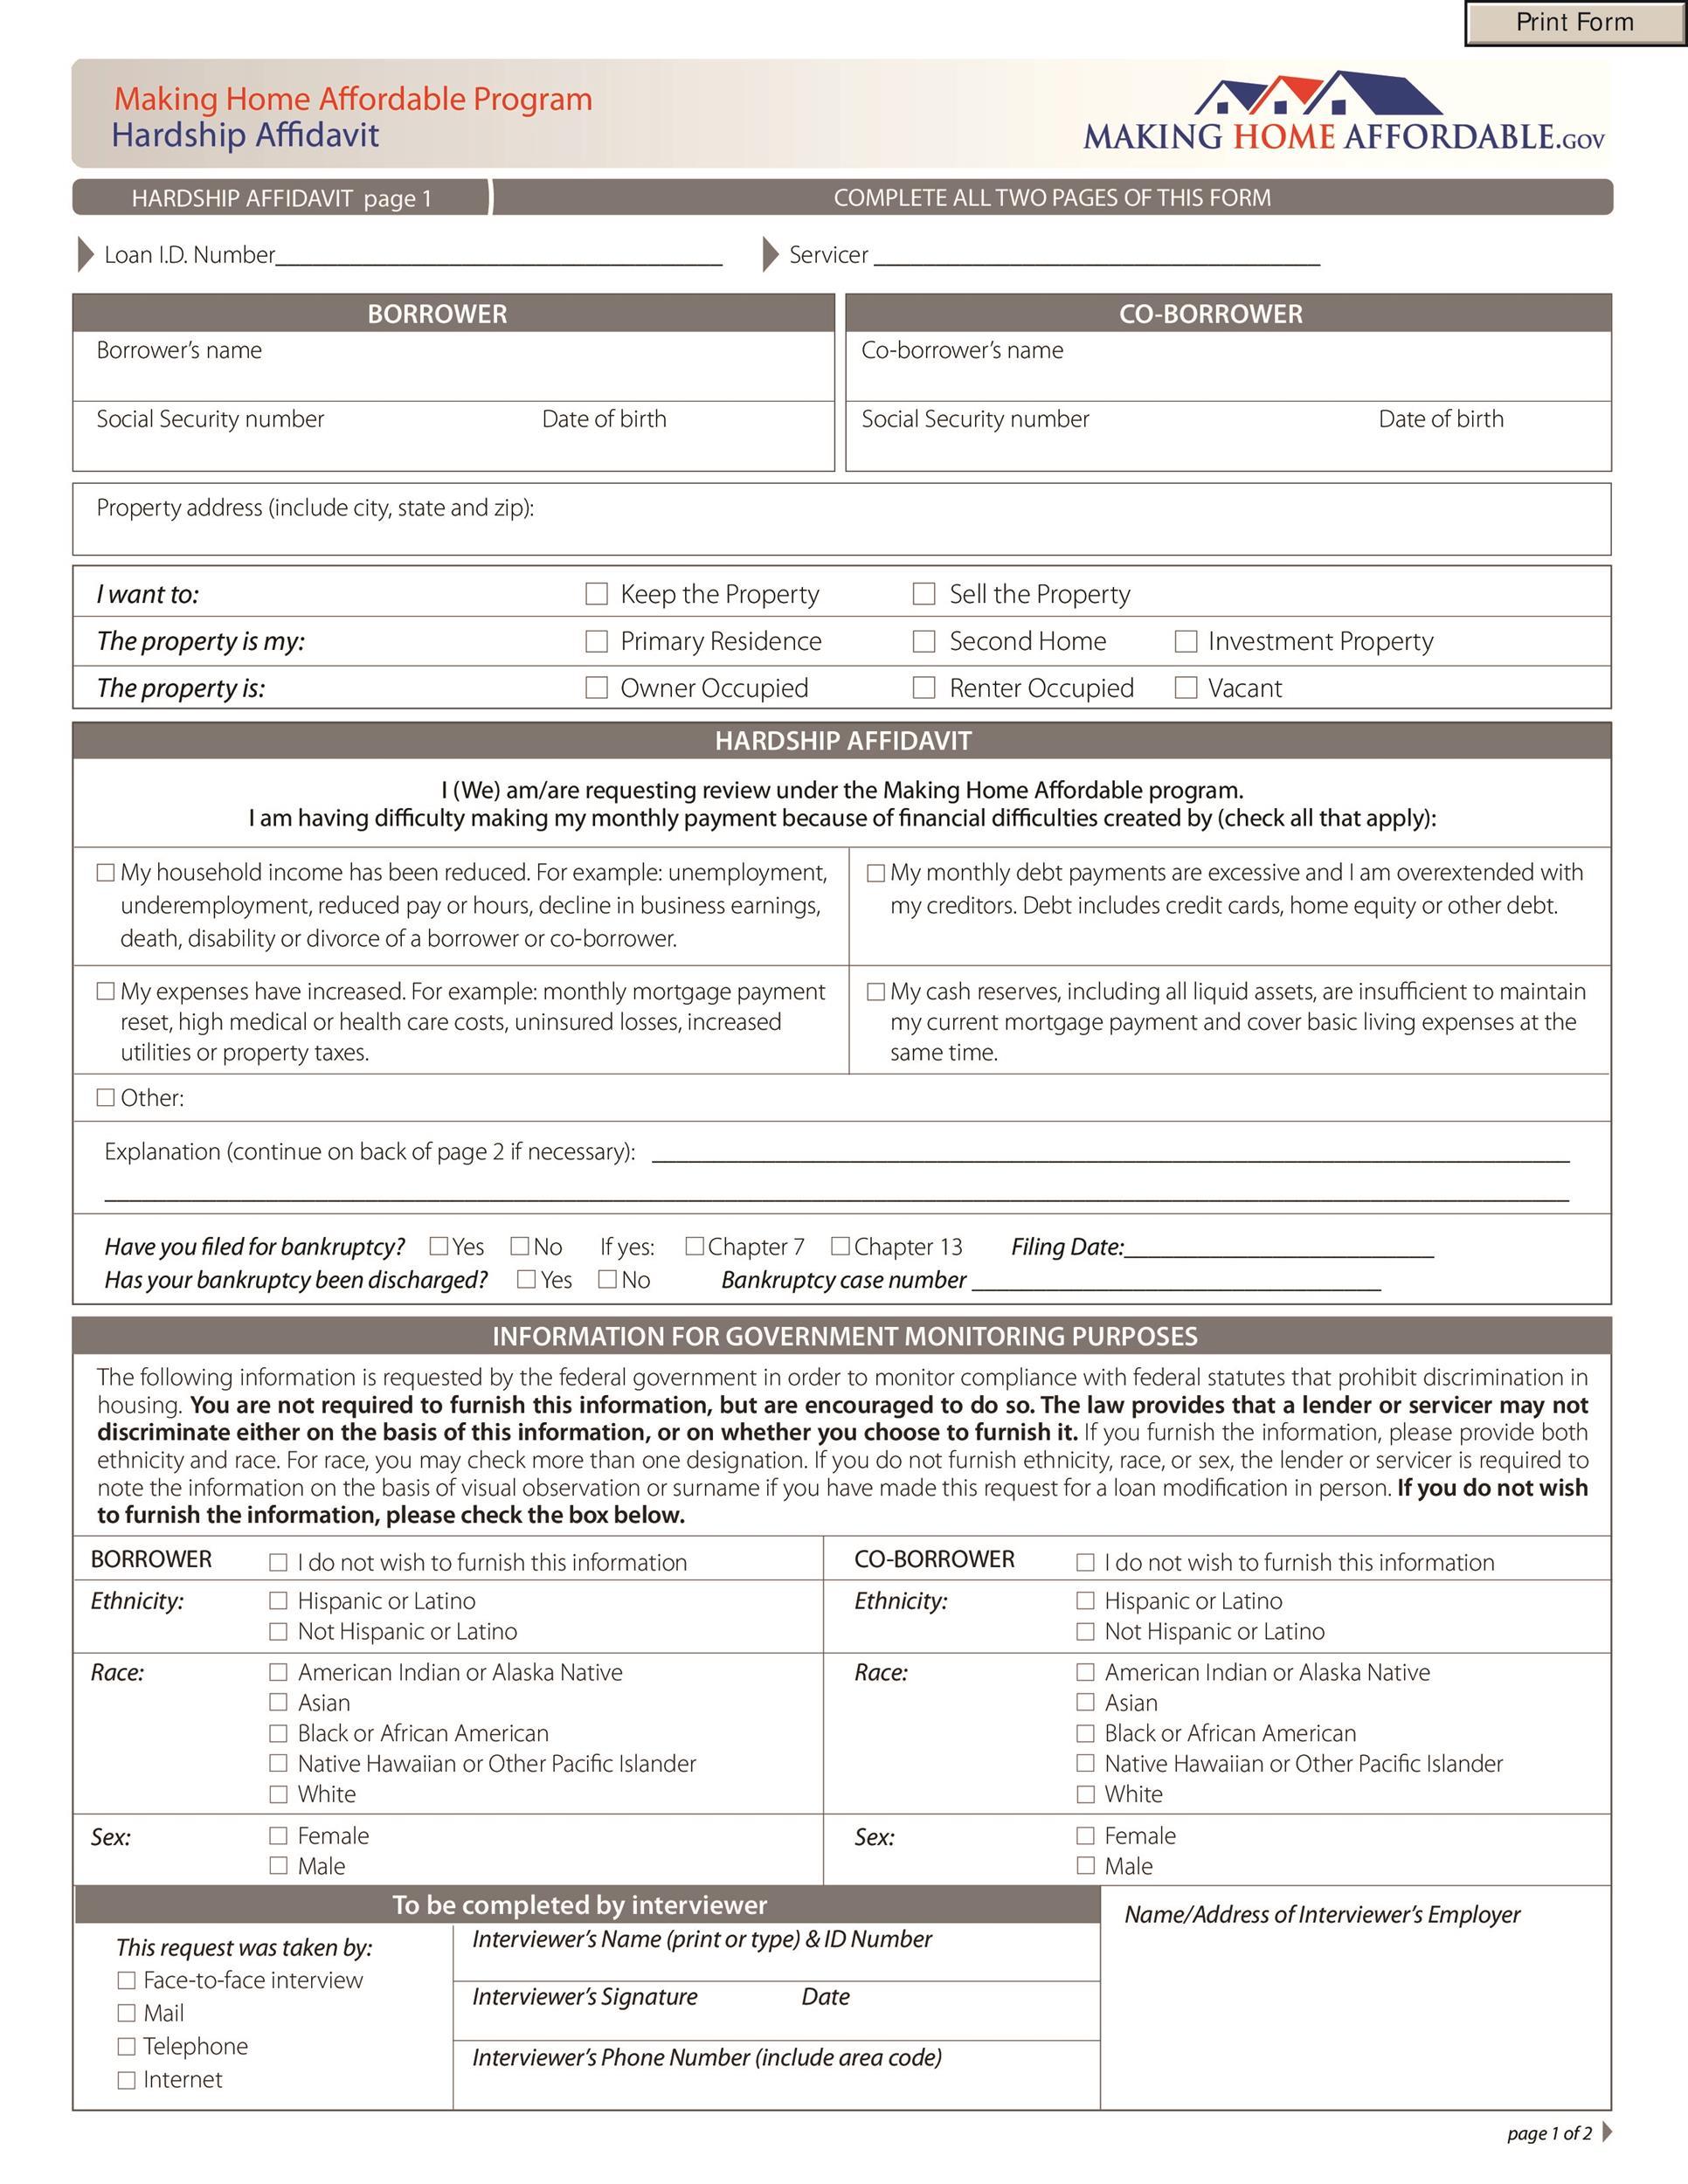 Free affidavit form 04